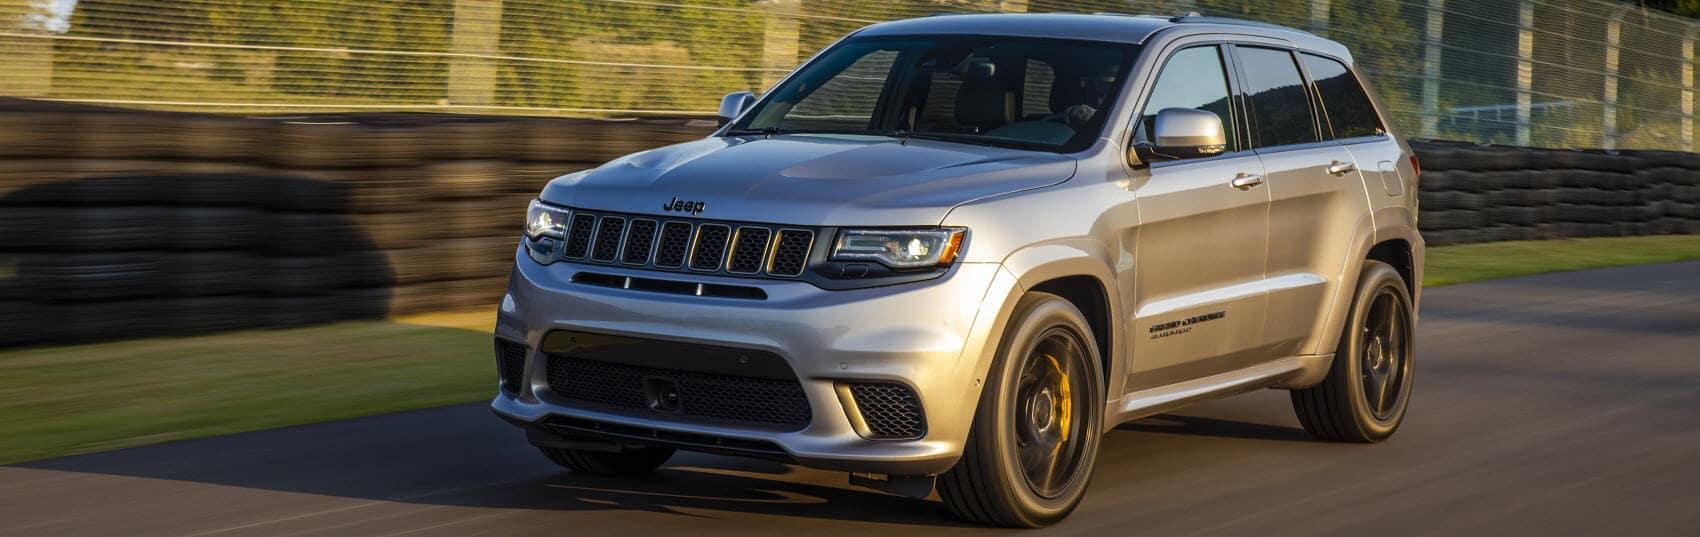 Jeep Grand Cherokee vs Ford Explorer